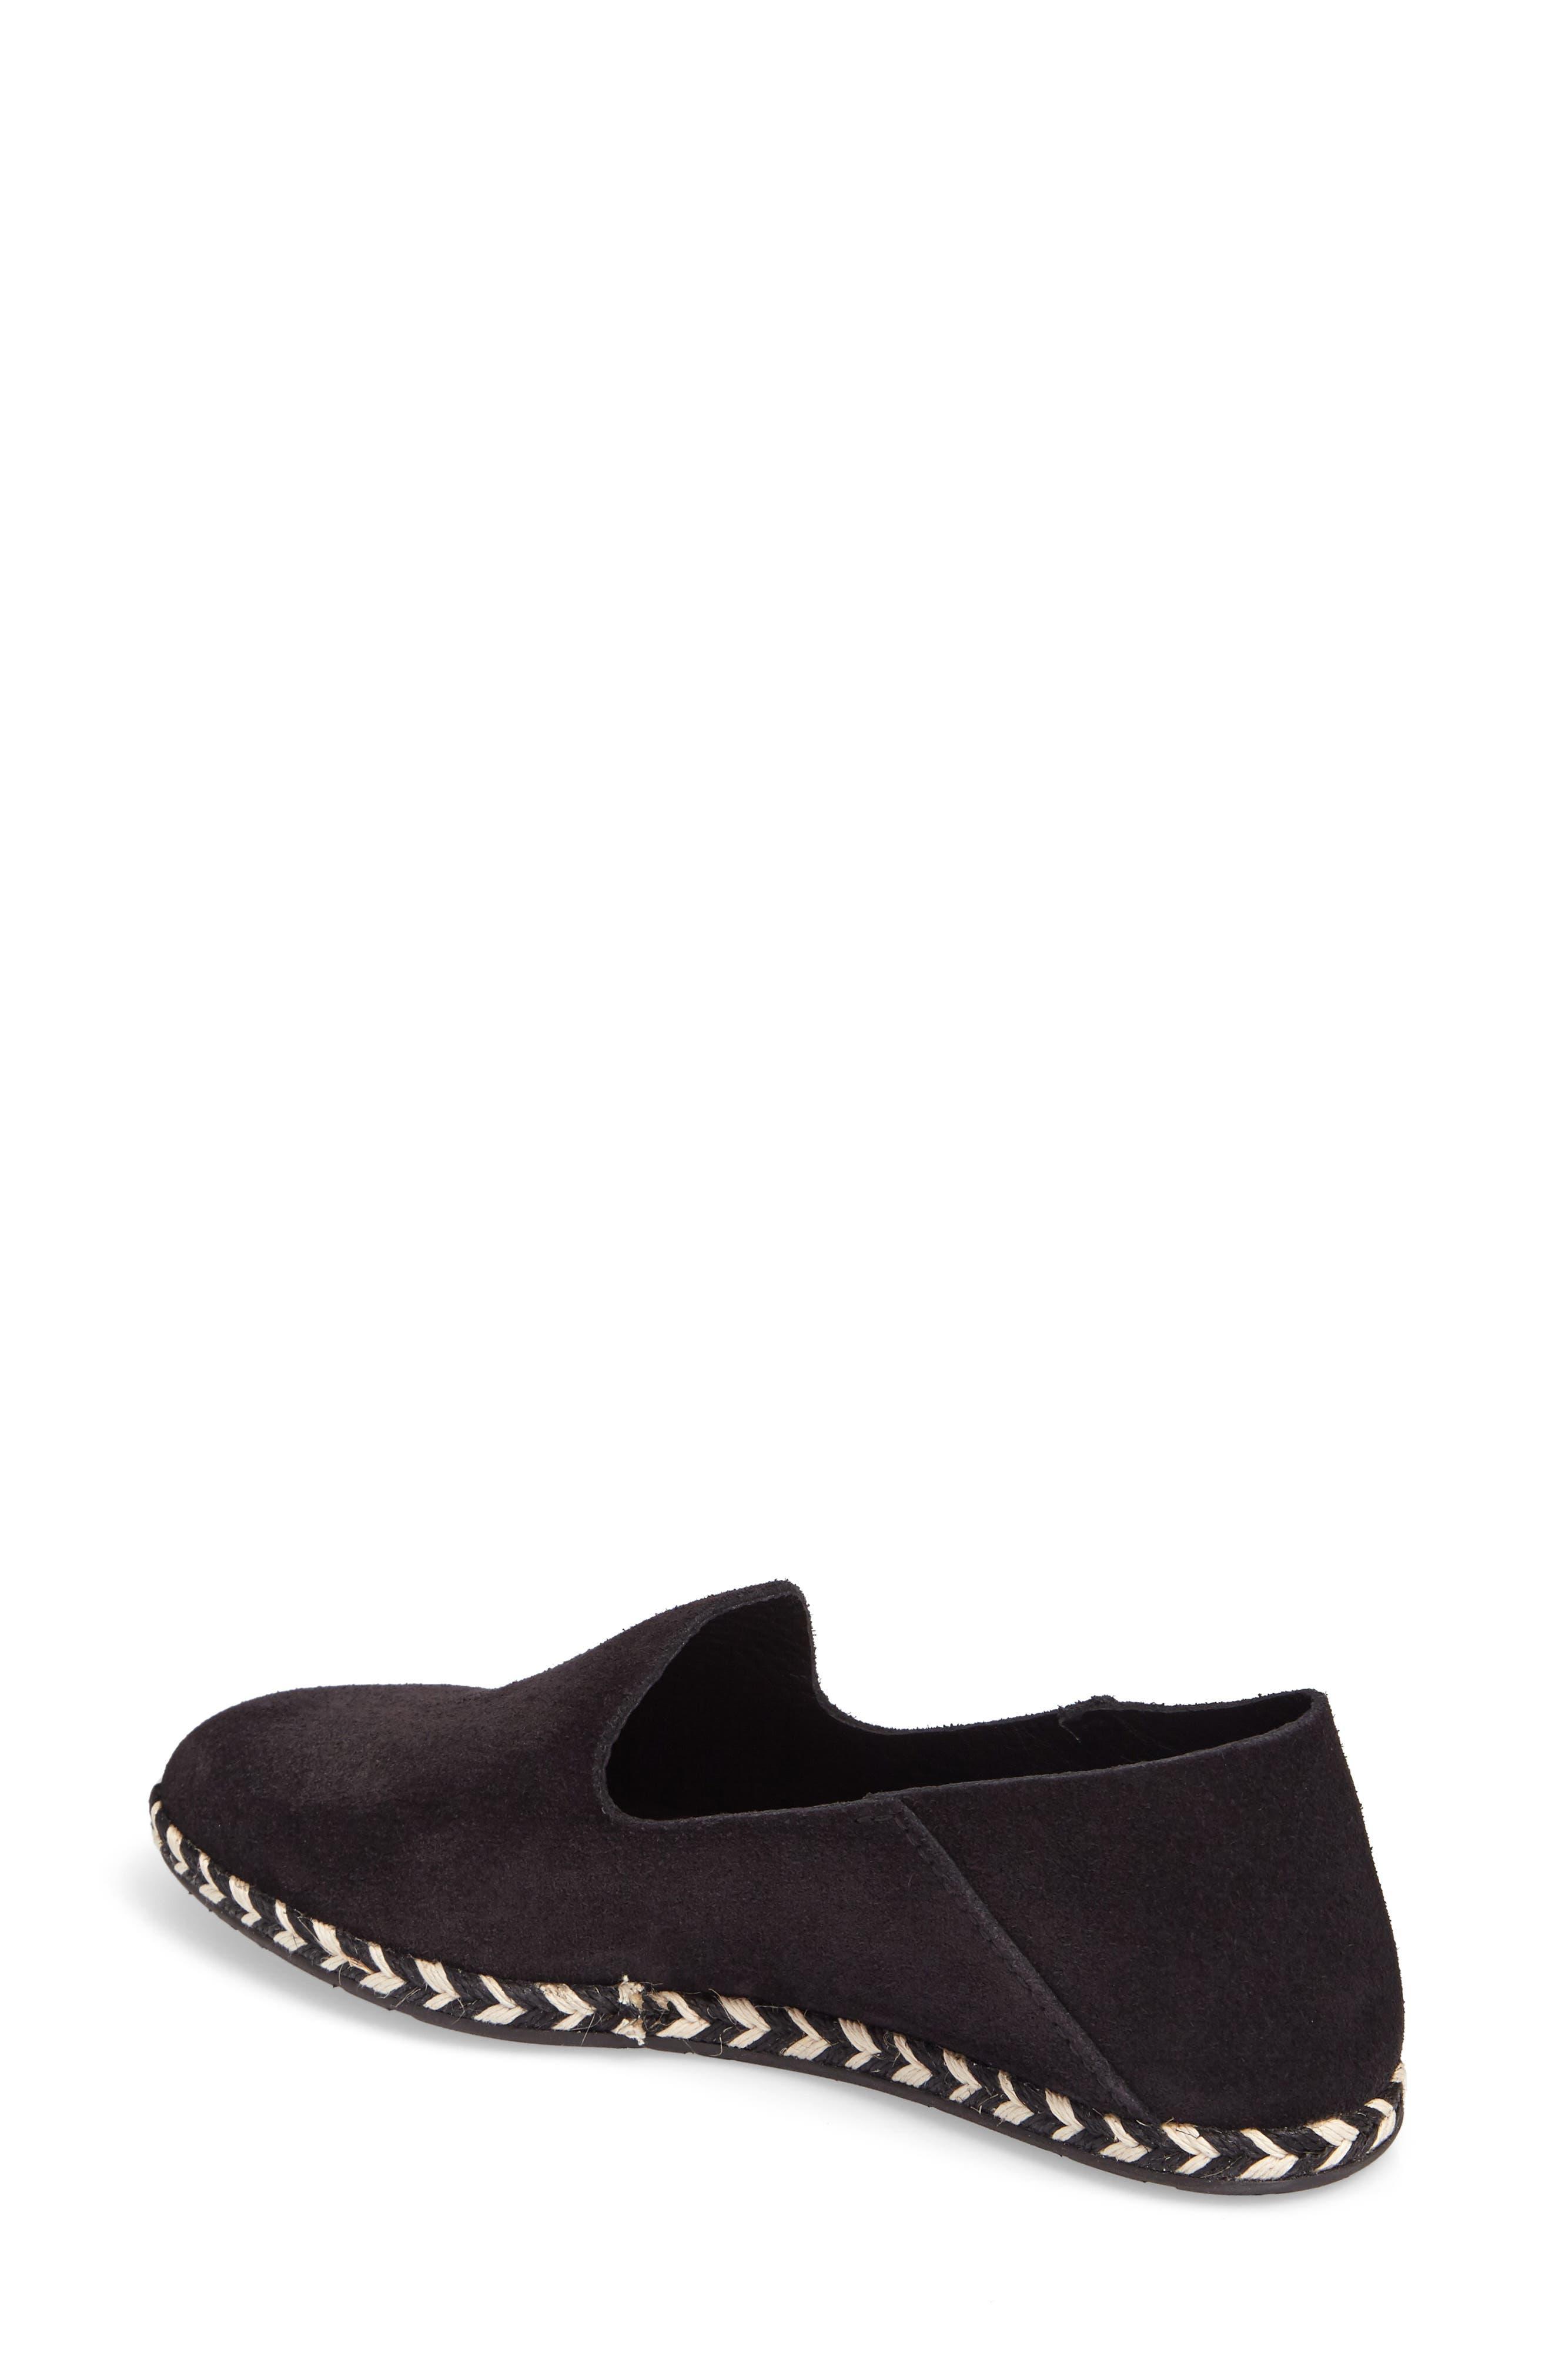 Yuli Convertible Woven Loafer,                             Alternate thumbnail 3, color,                             BLACK